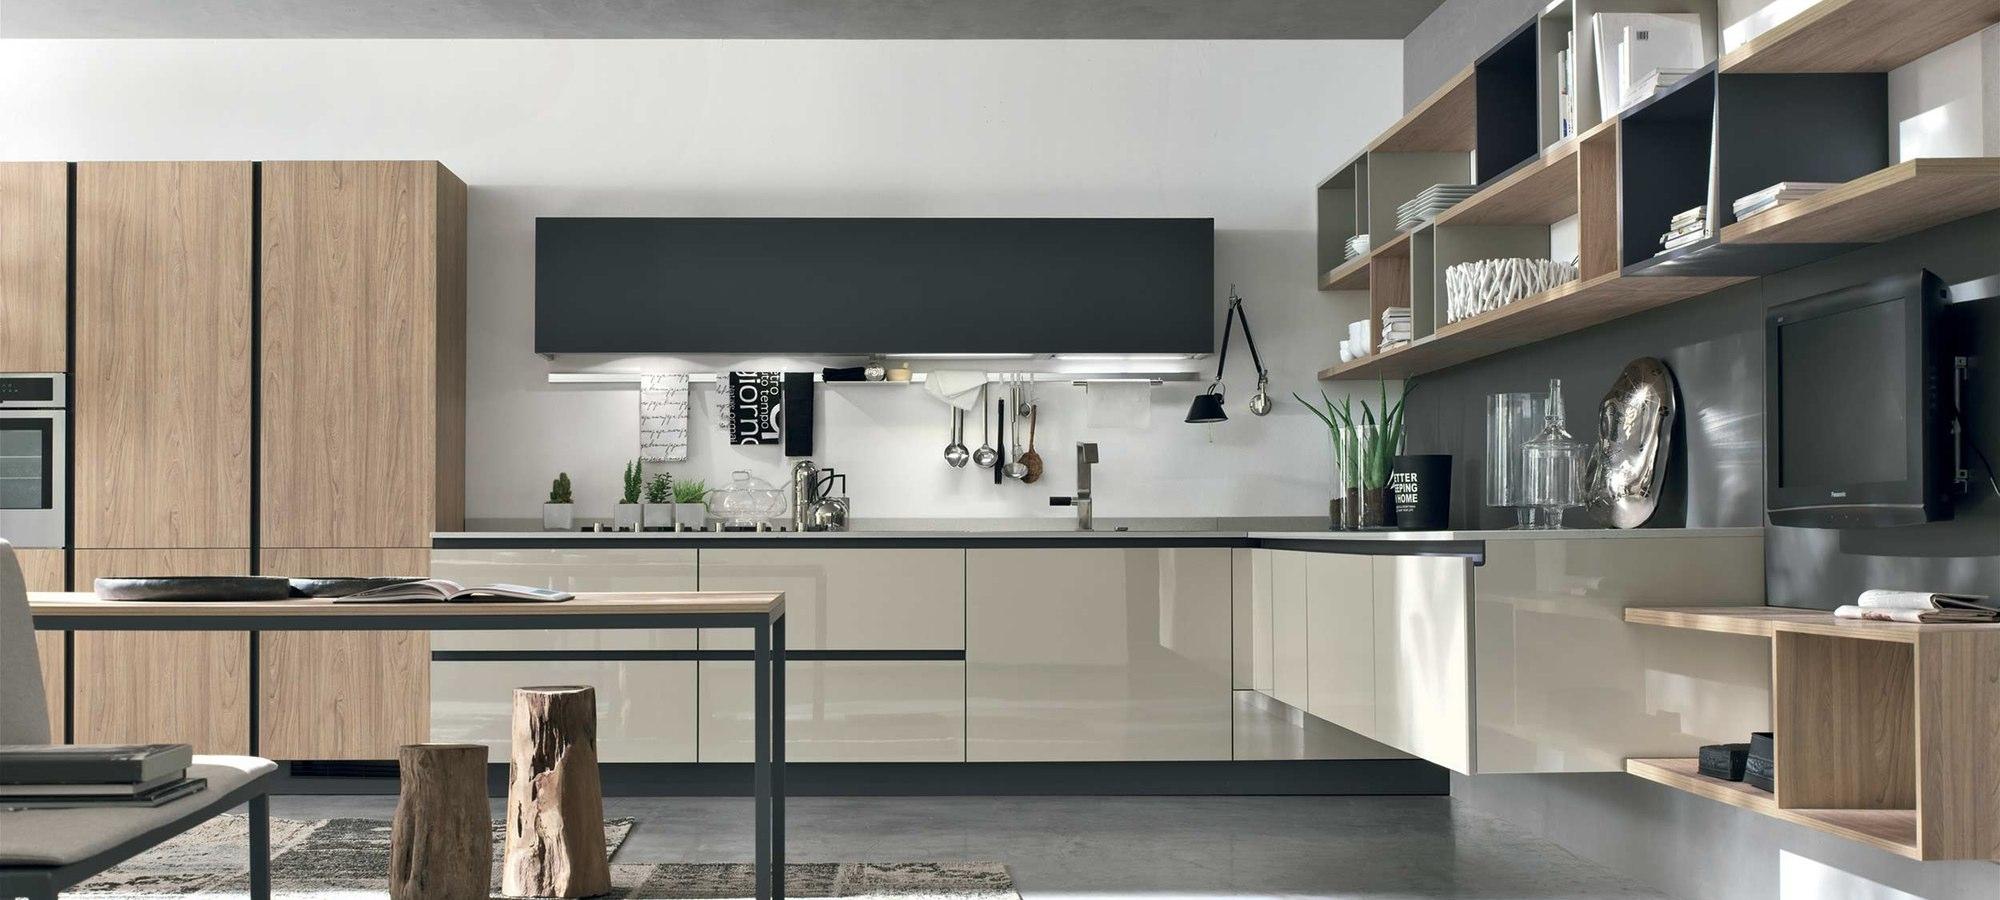 Cucina stosa cucine alev composizione lineare cucine a for Cucine stosa prezzi